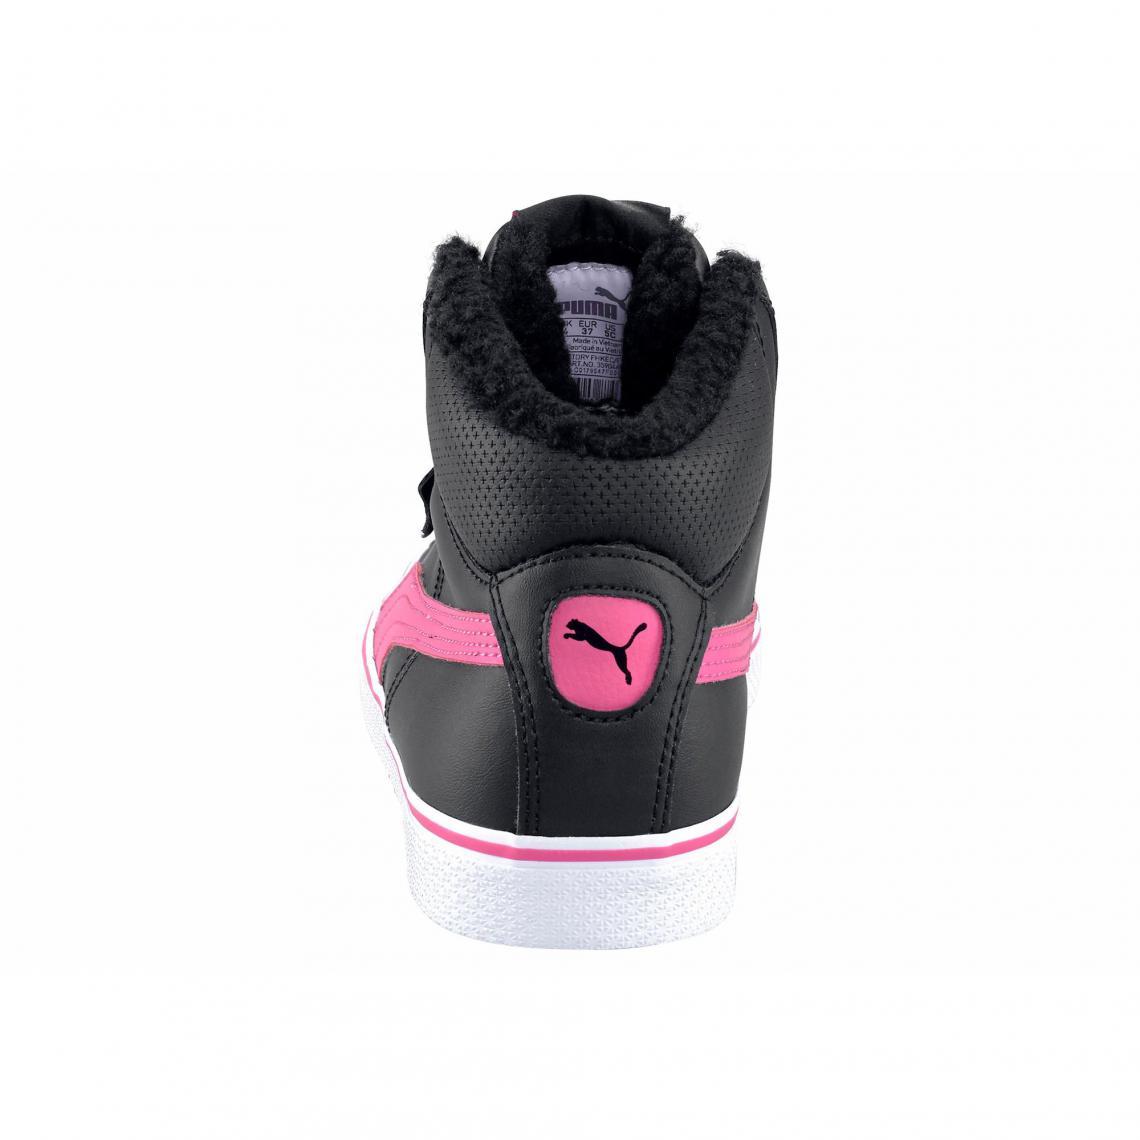 Hautes Vulc Mixte Baskets Rose Vif Enfant Jr Puma Mid Perf Noir Sq7PRnwx